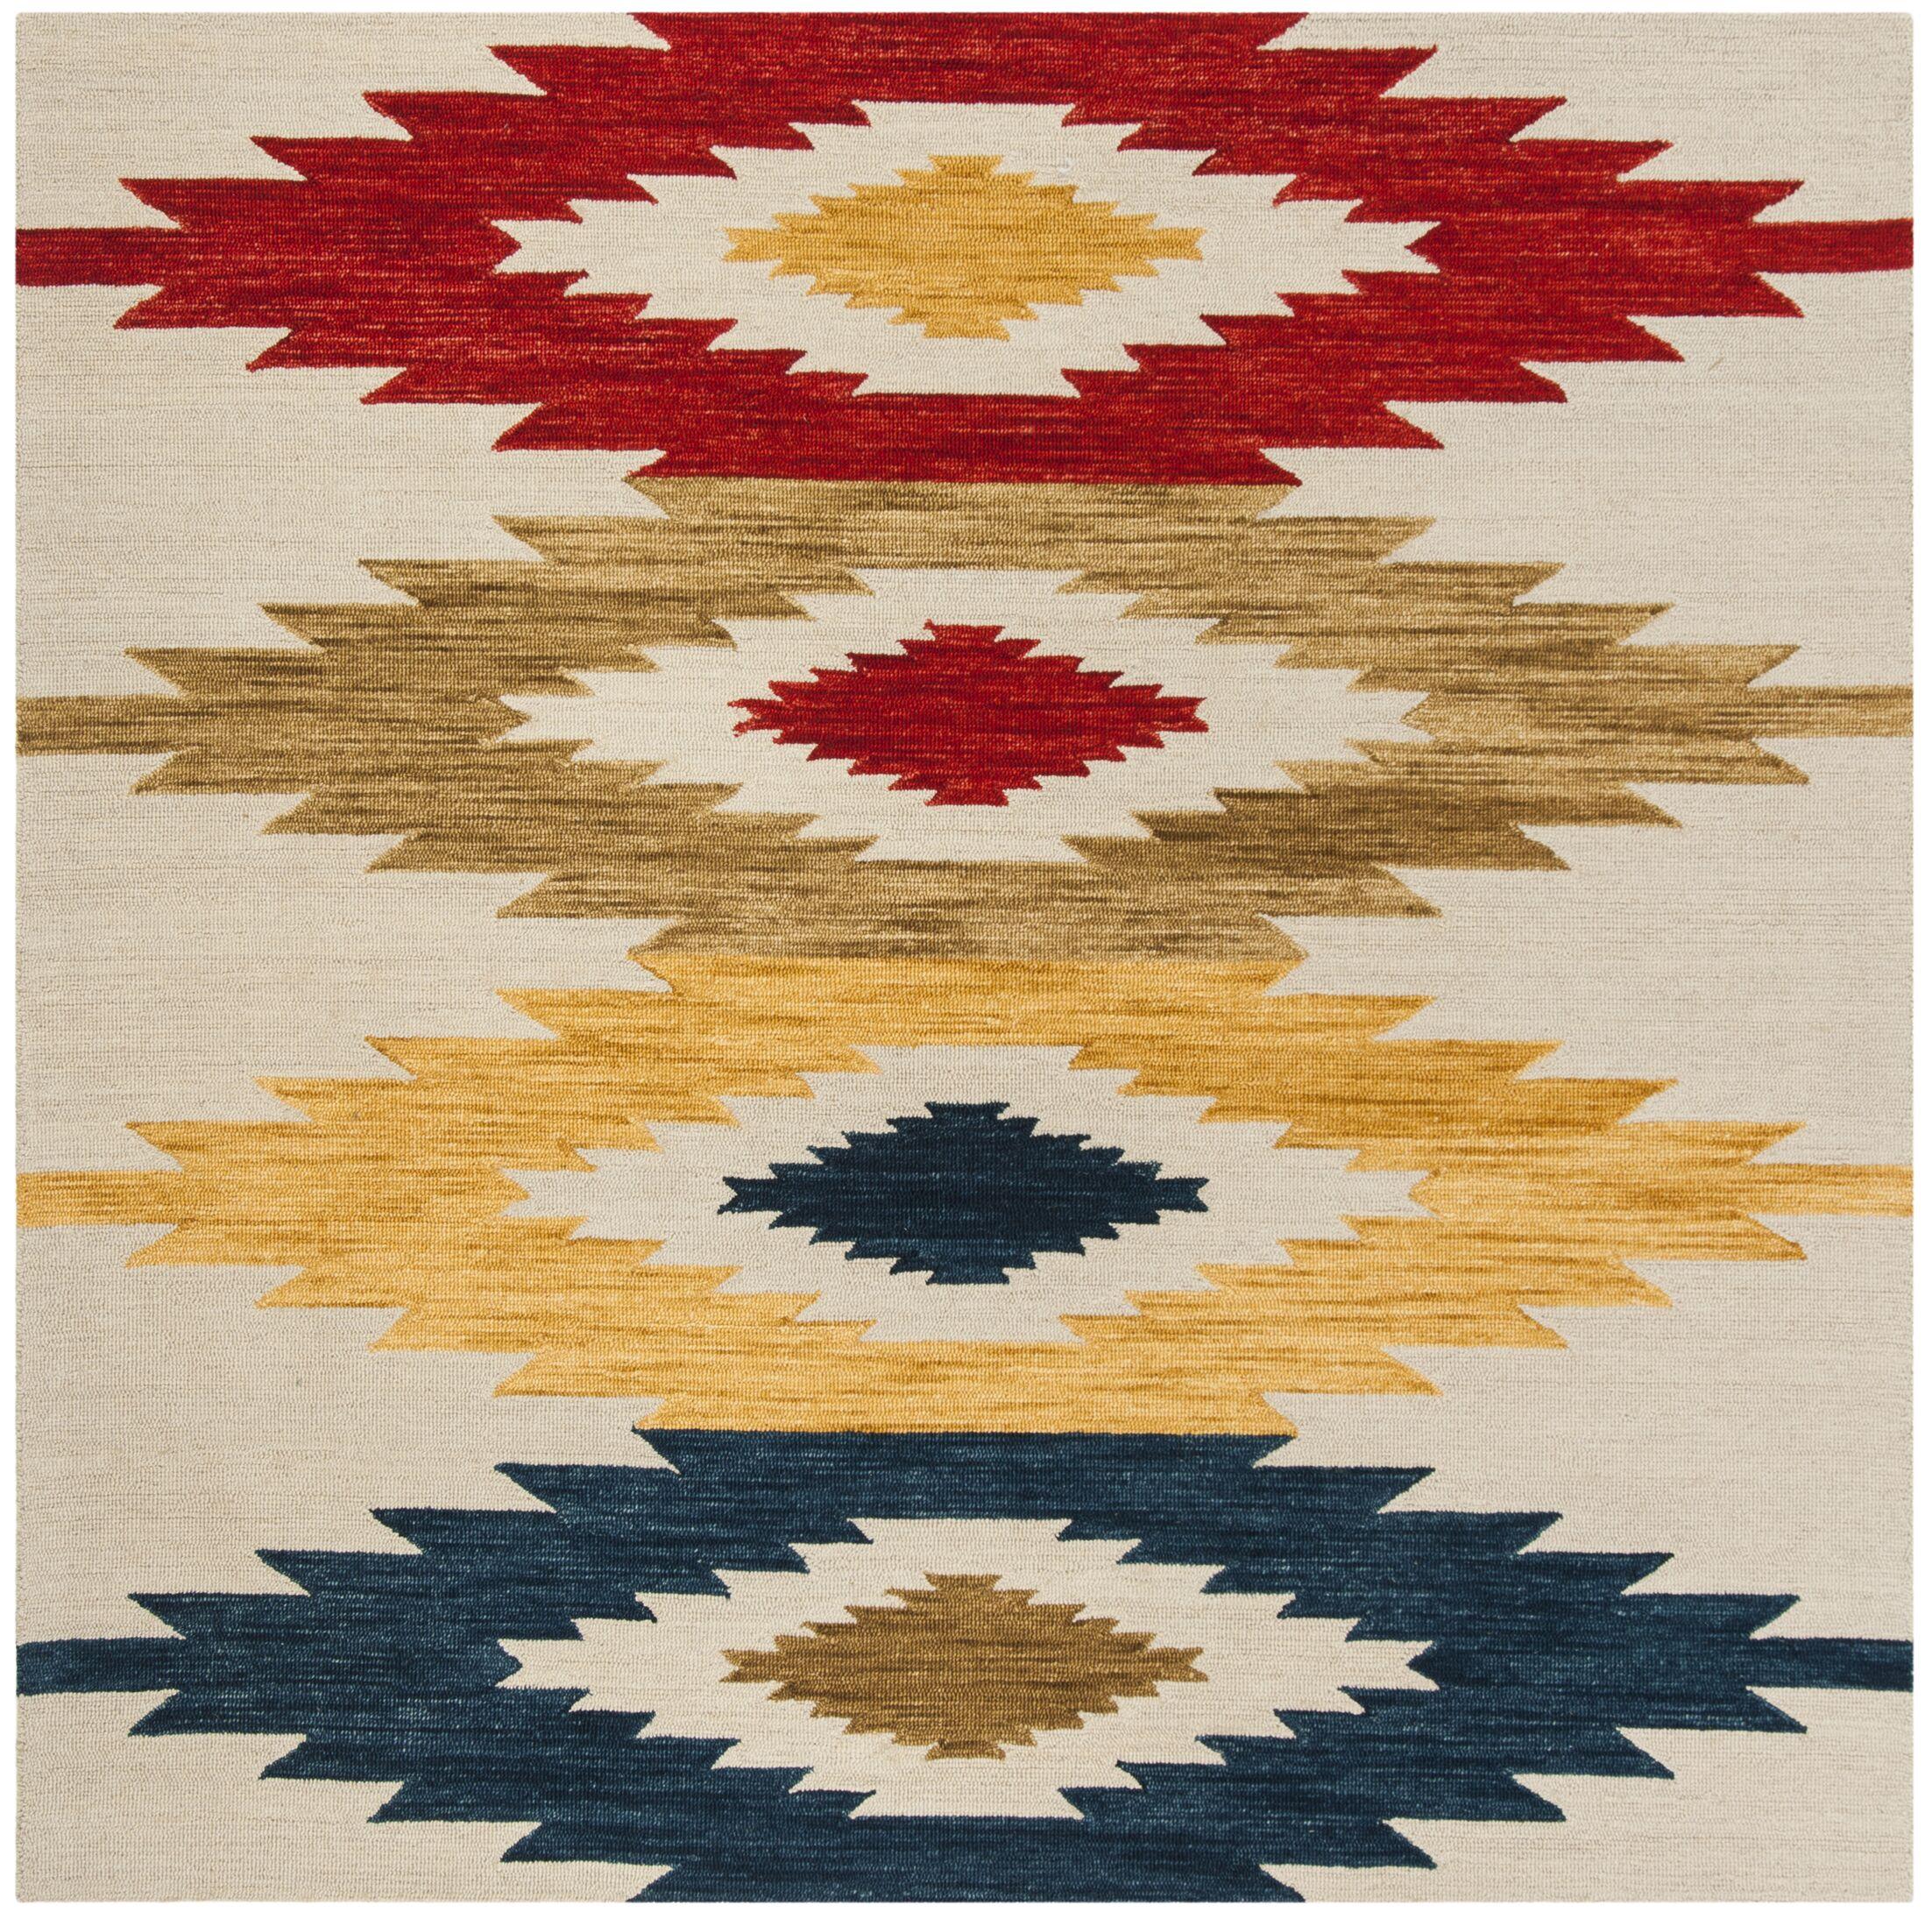 Aldwich Hand-Tufted Multi-Color Area Rug Rug Size: Square 7'